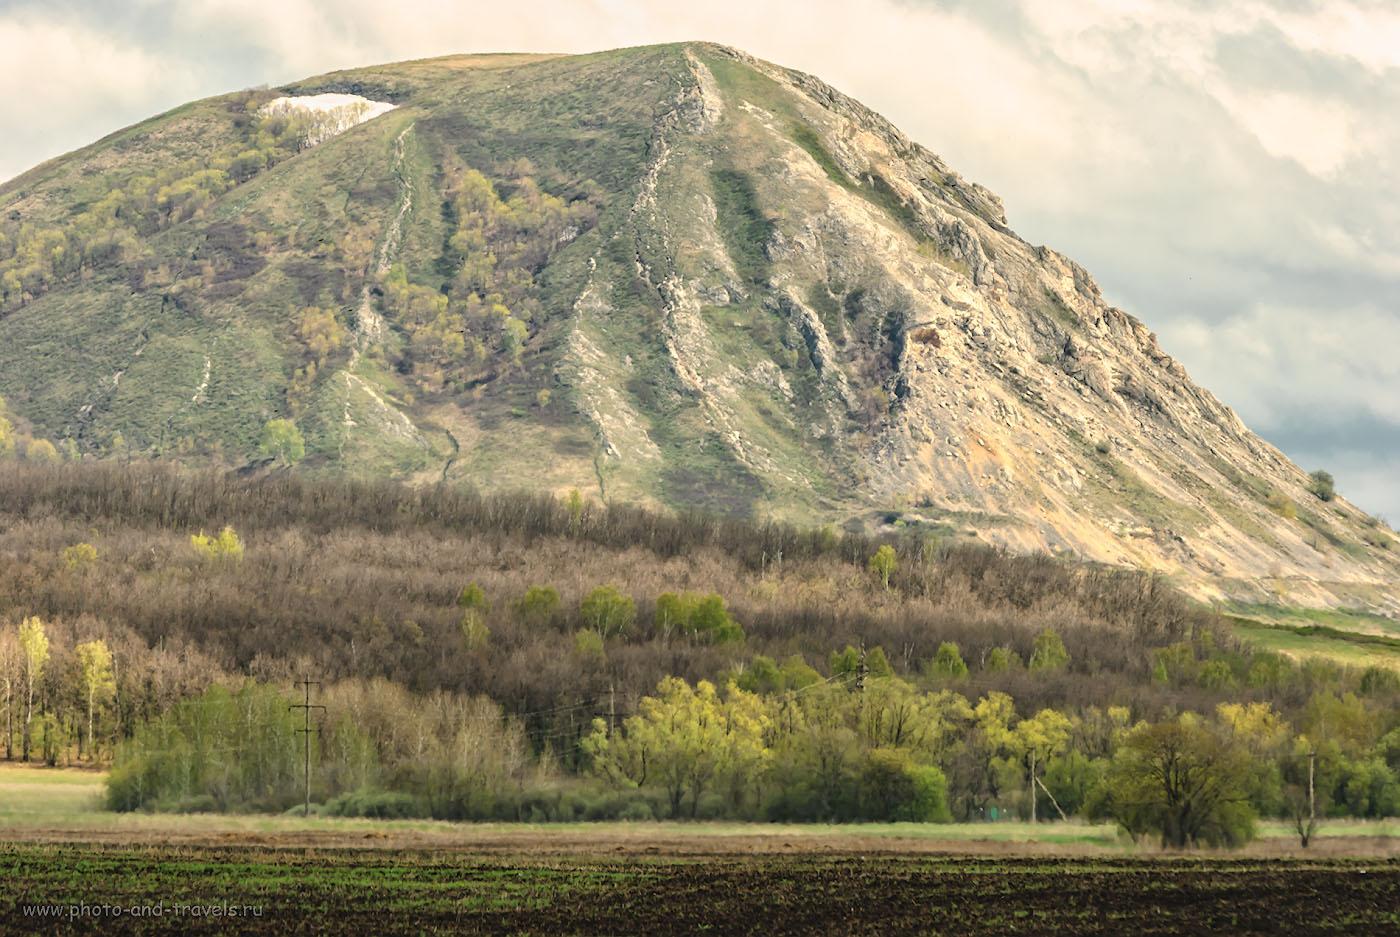 Фото 28. Шихан Торатау. Как отдохнуть в Башкортостане? Забраться на эту гору. Фотоаппарат Nikon D80. Телеобъектив Nikon 70-200mm f/2.8, телеконвертор TC-14 E II. Настройки: 1/250, -0.67, 8.0, 100, 260.